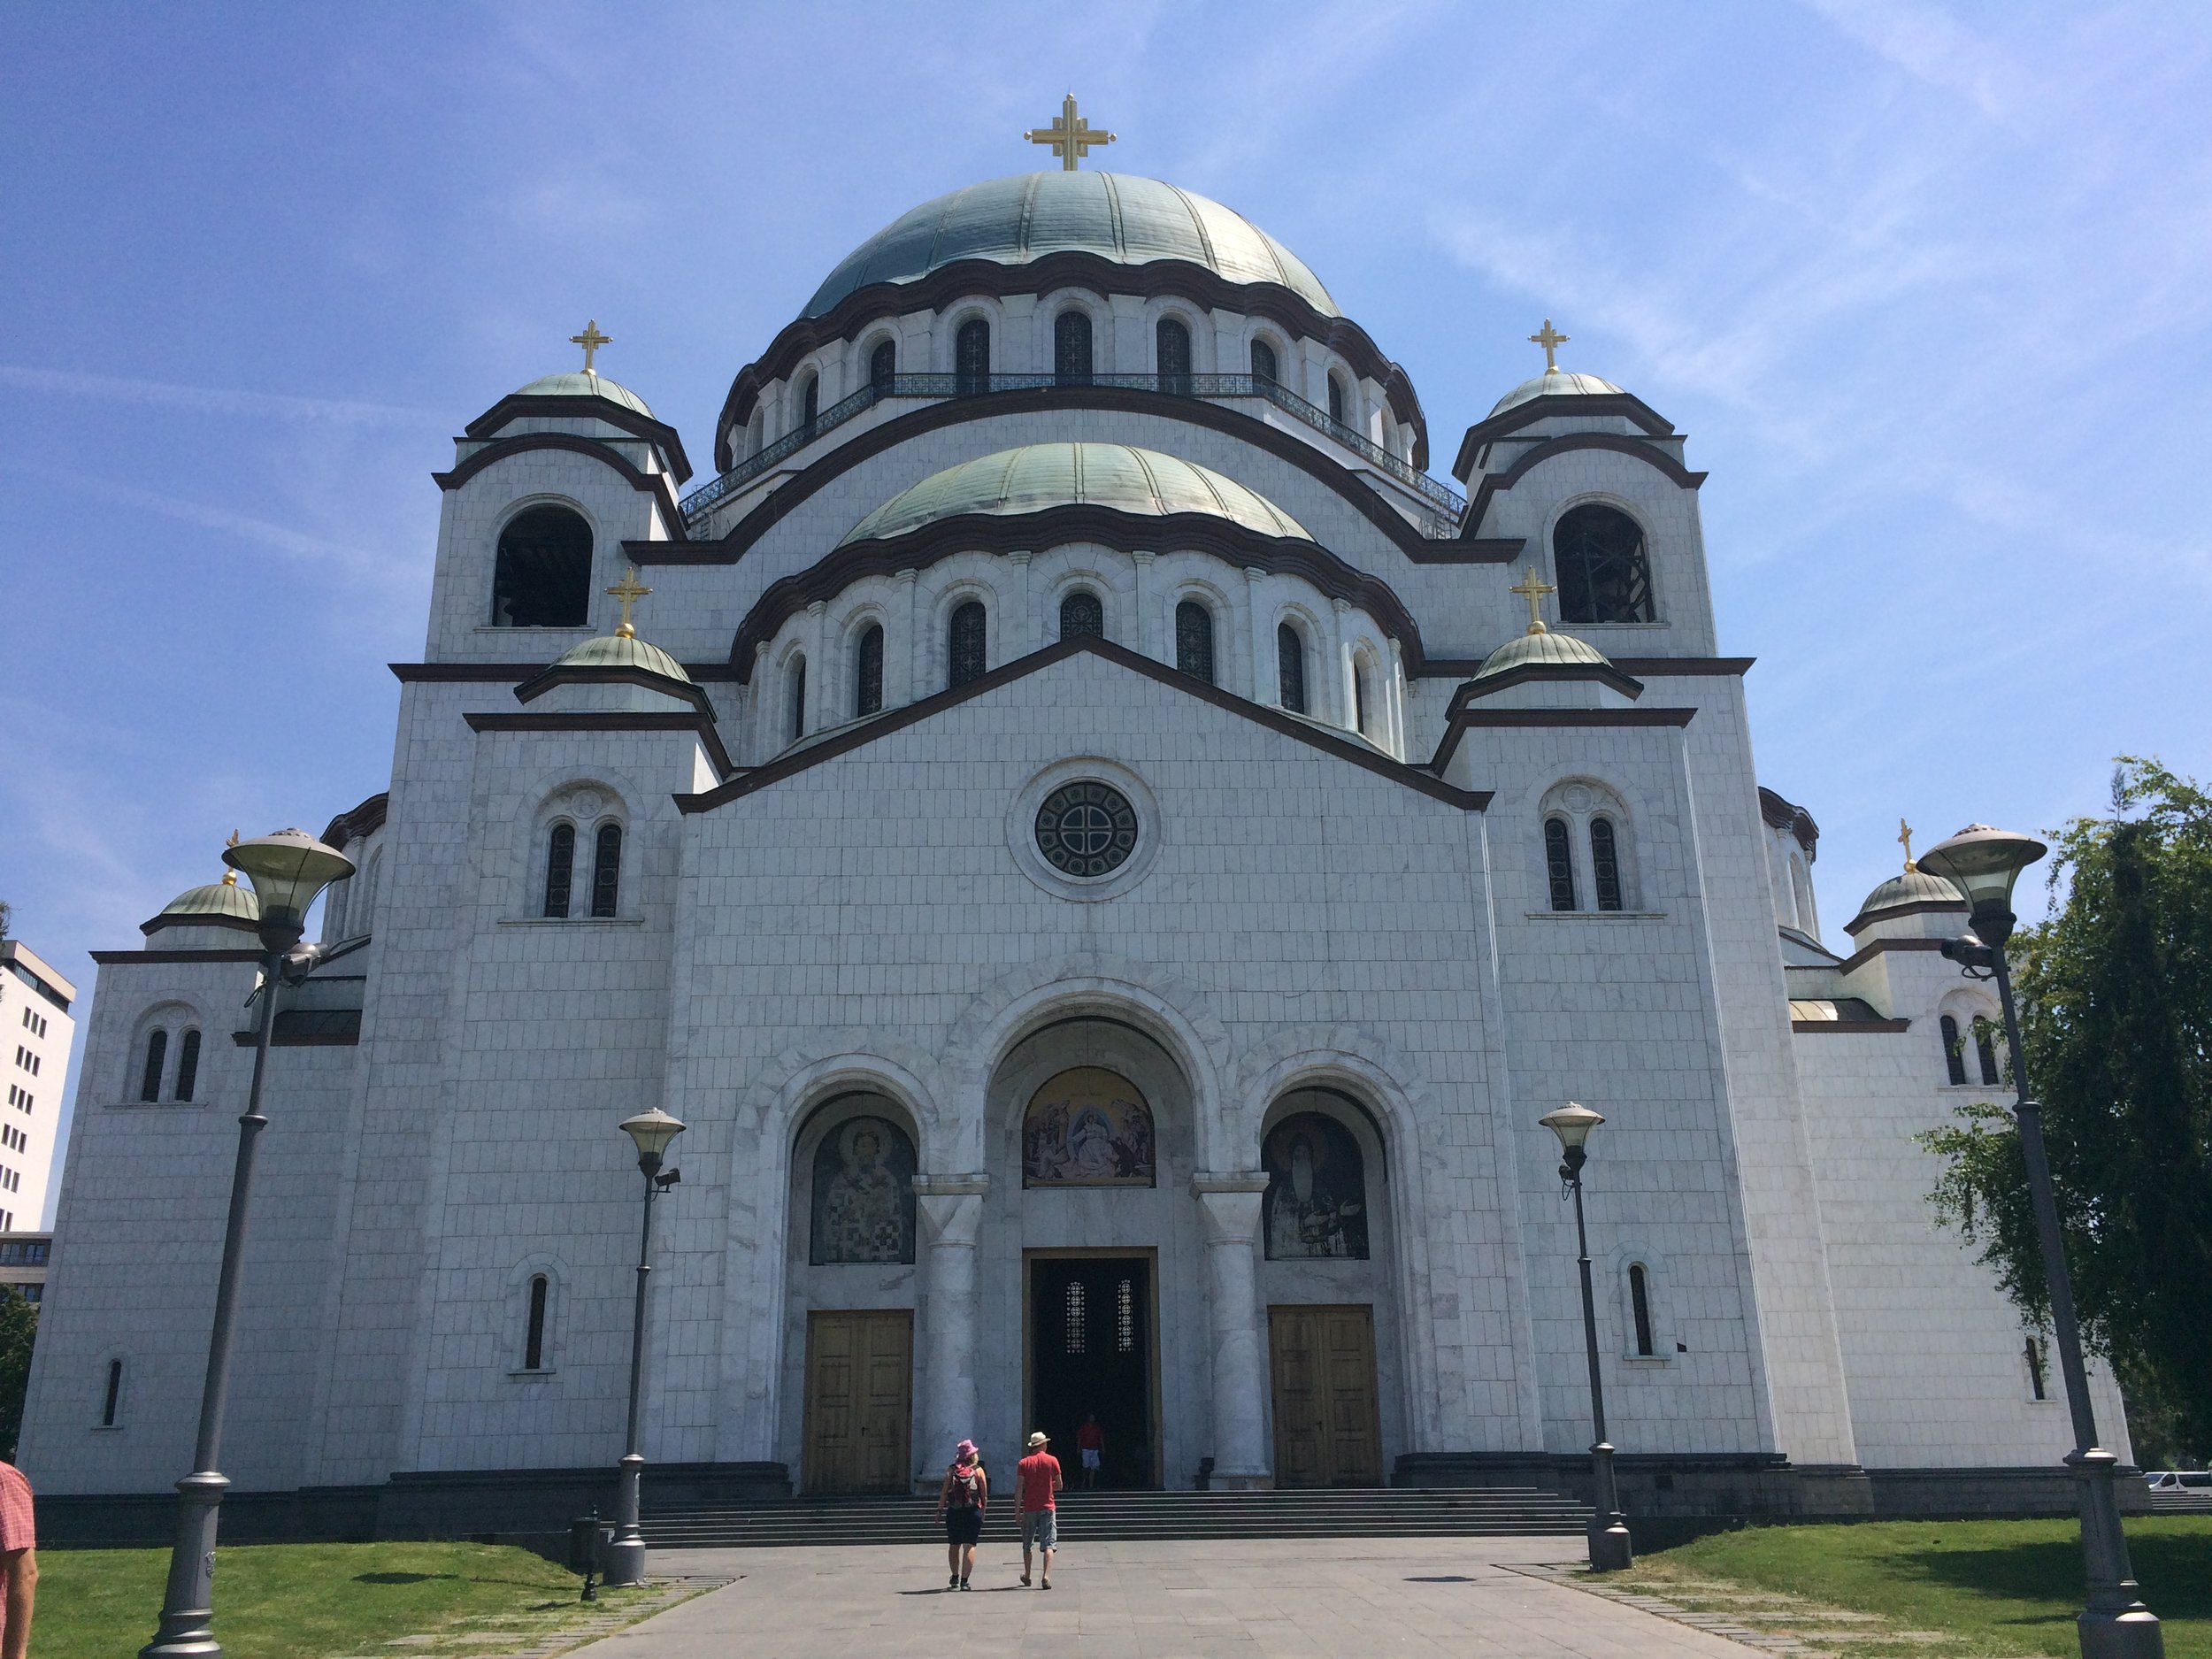 St. Sava Orthodox Cathedral